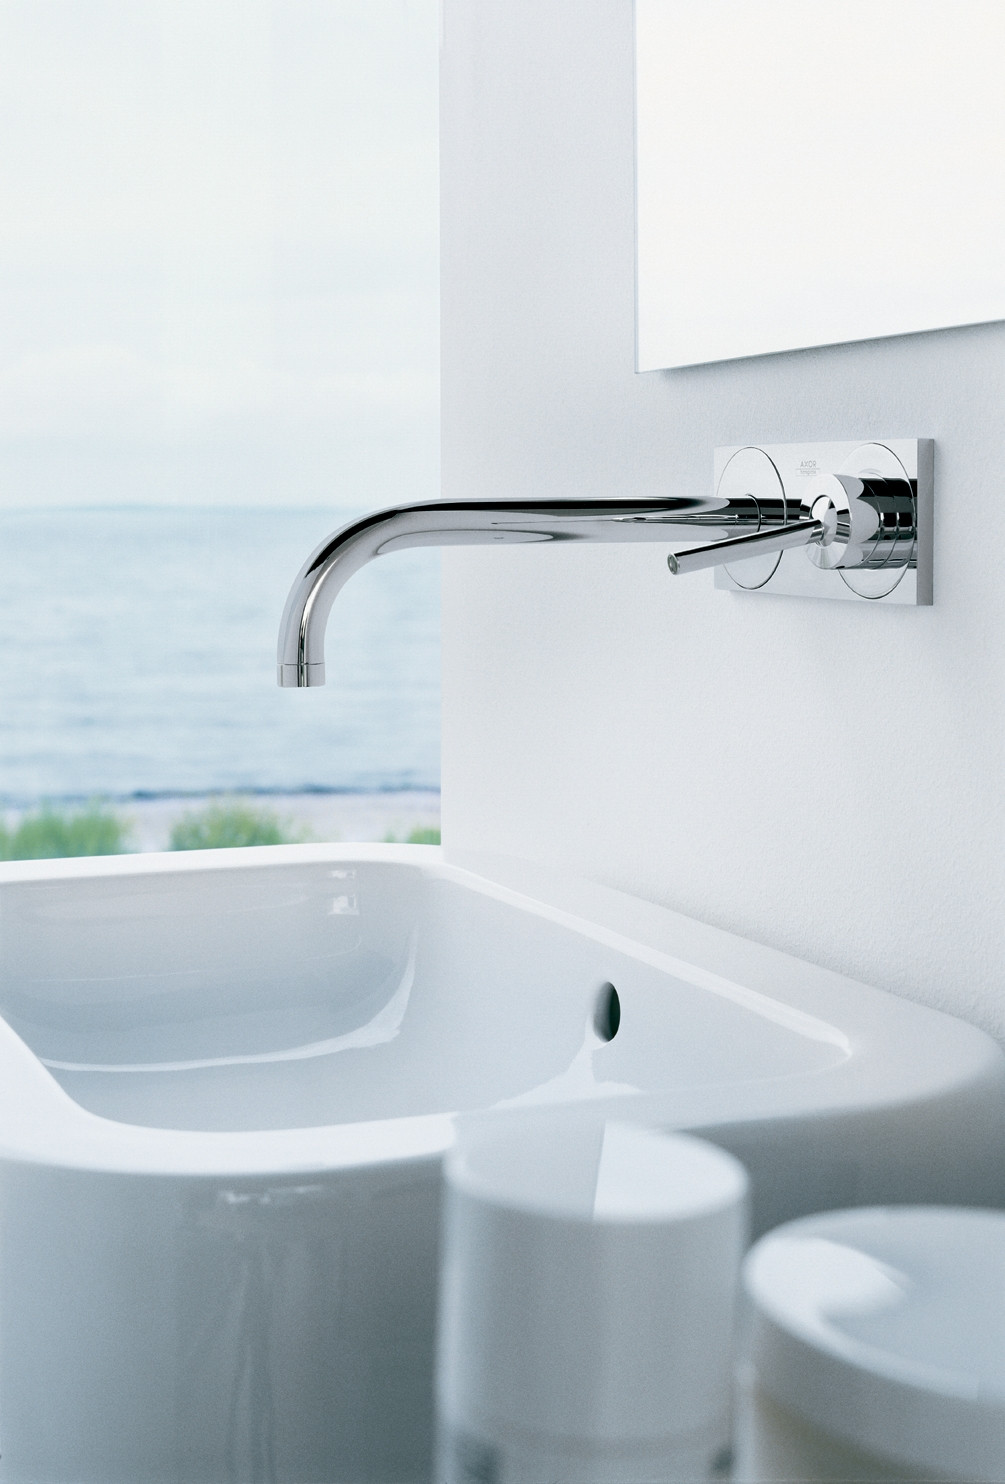 Bath4All - Hansgrohe 38117001 Chrome Axor Uno 2 Bathroom Faucet Wall ...